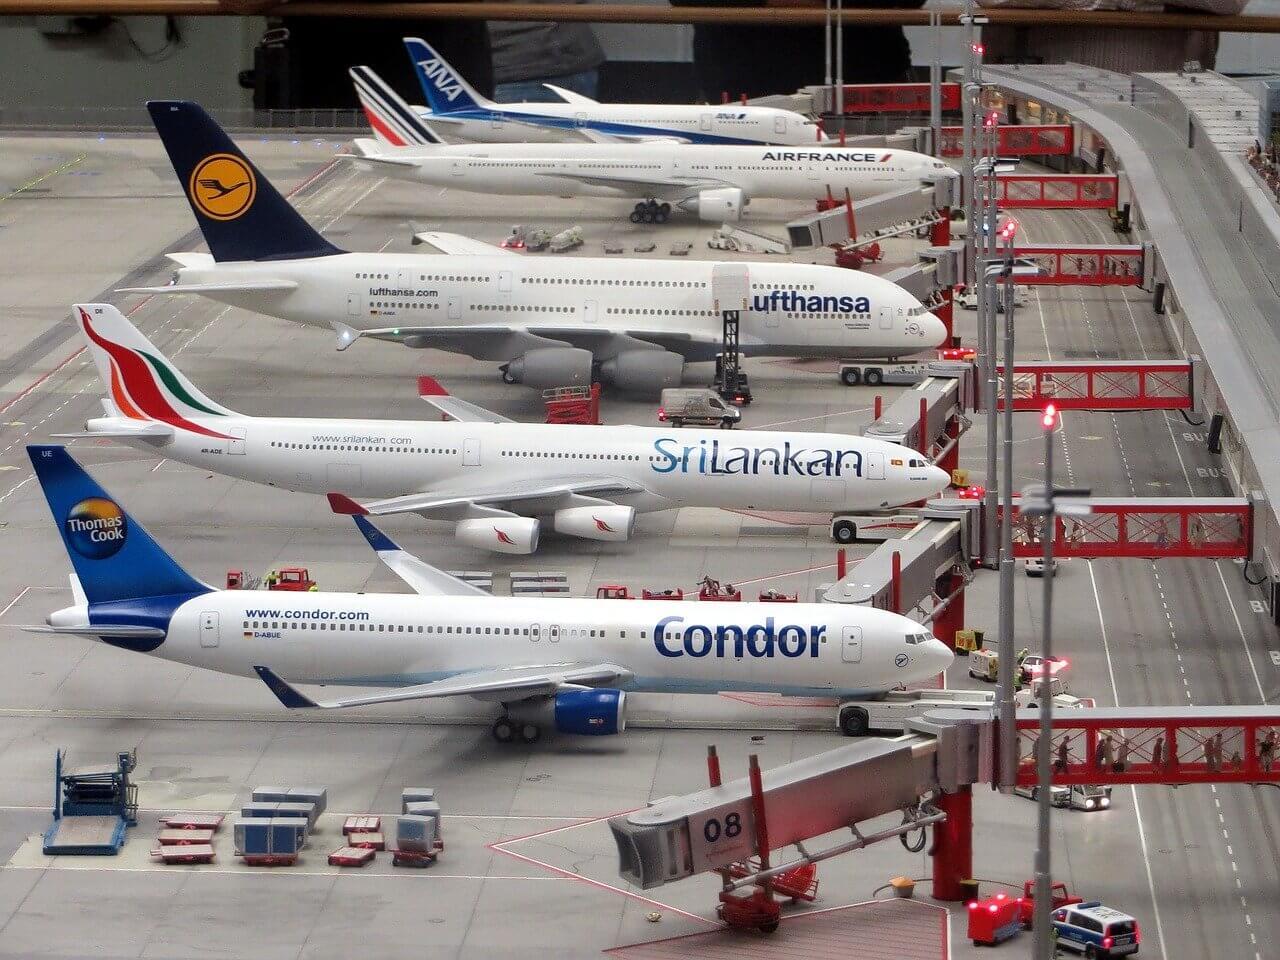 model-planes-1566822_1280